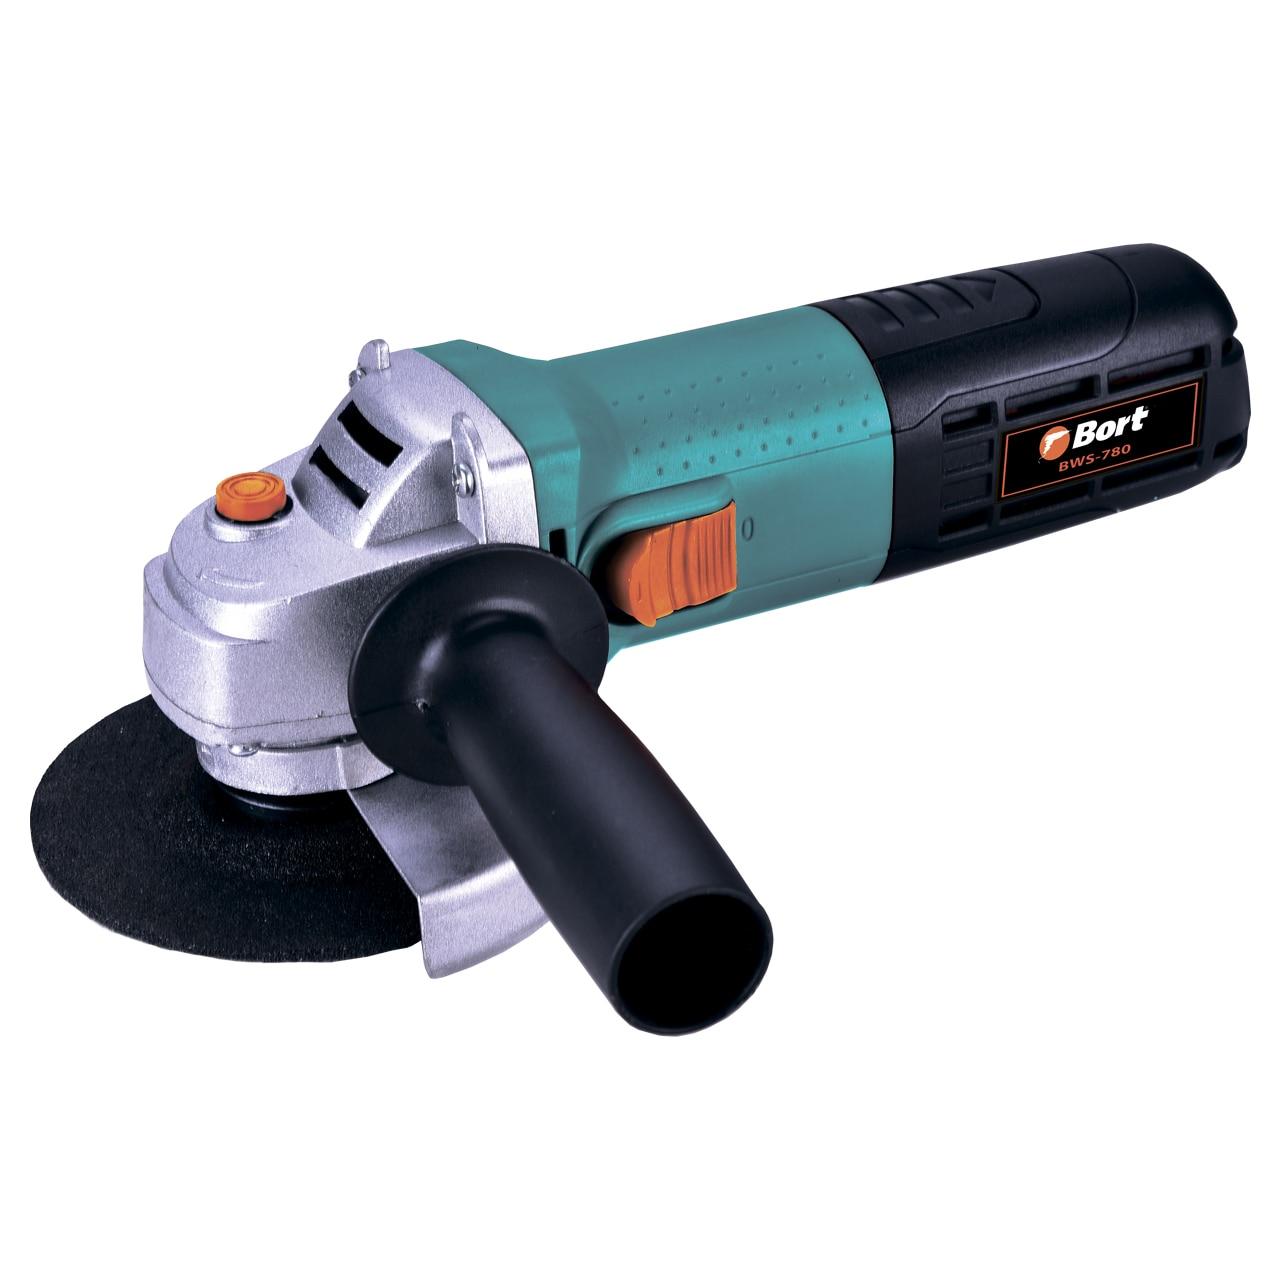 Angle grinder BORT BWS-780